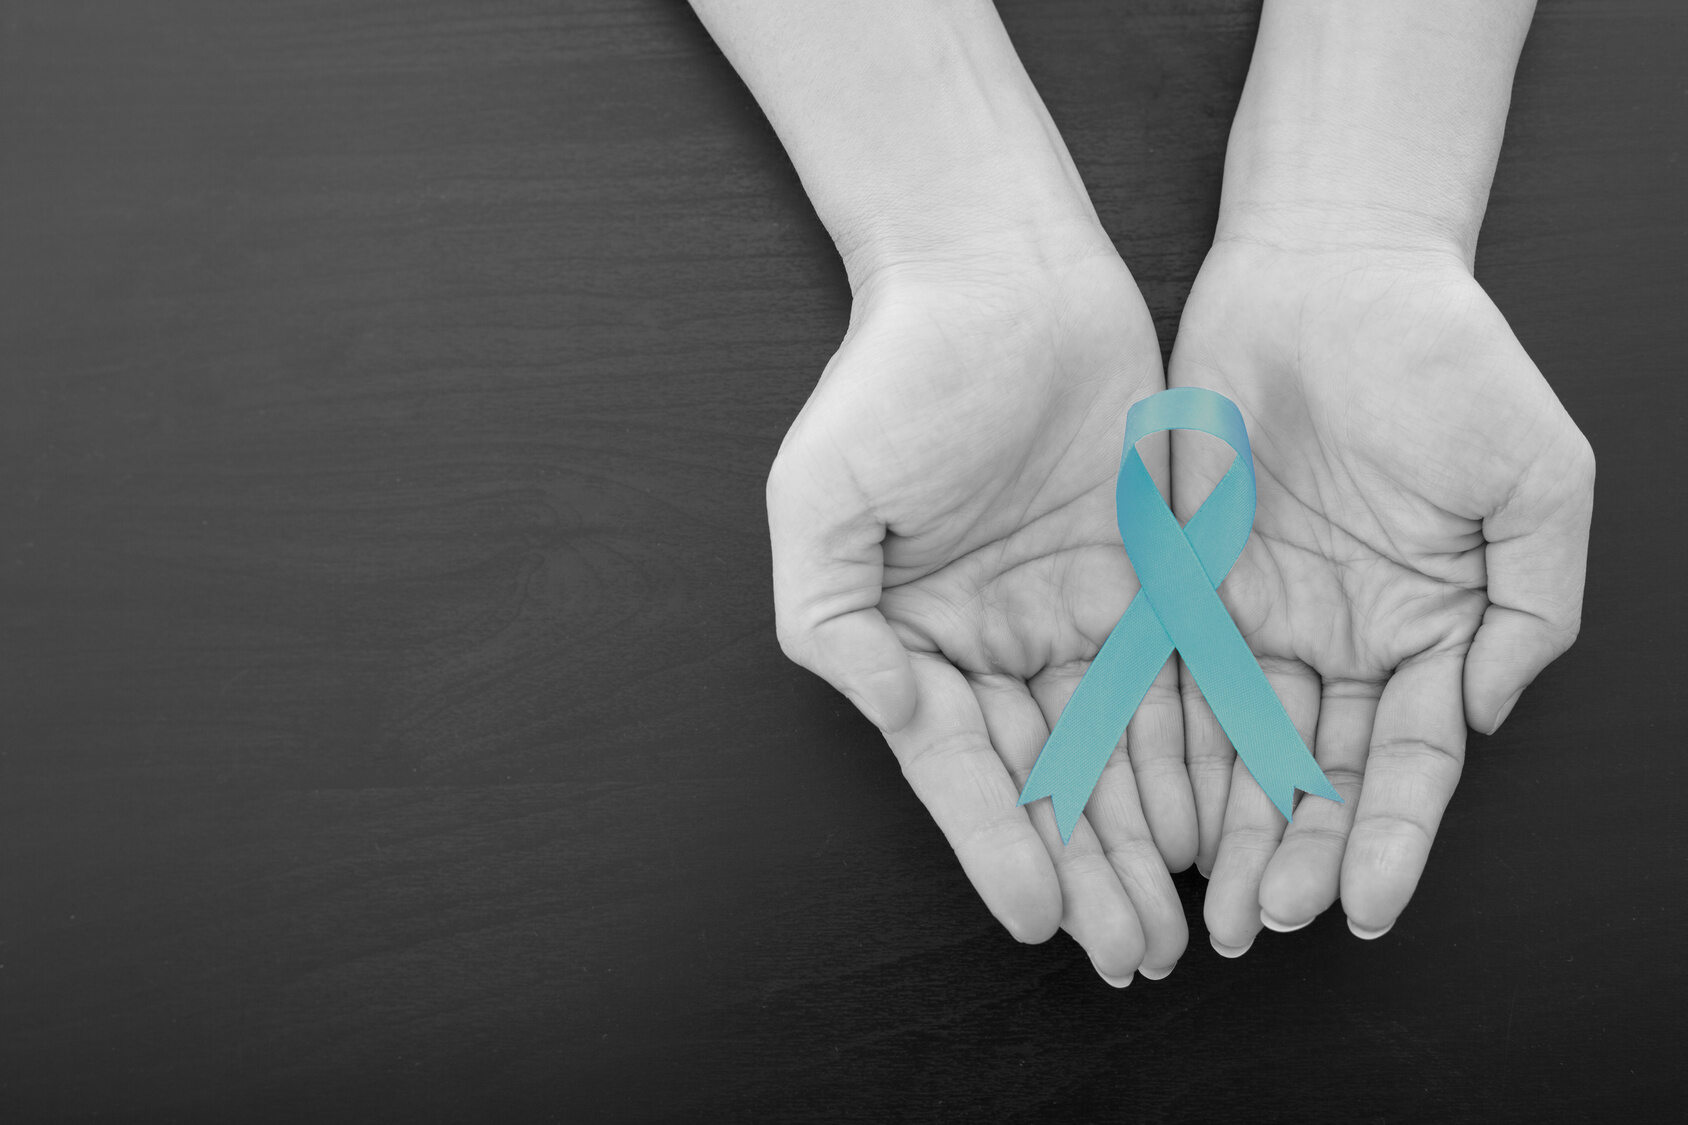 Wstążka - symbol raka jajnika